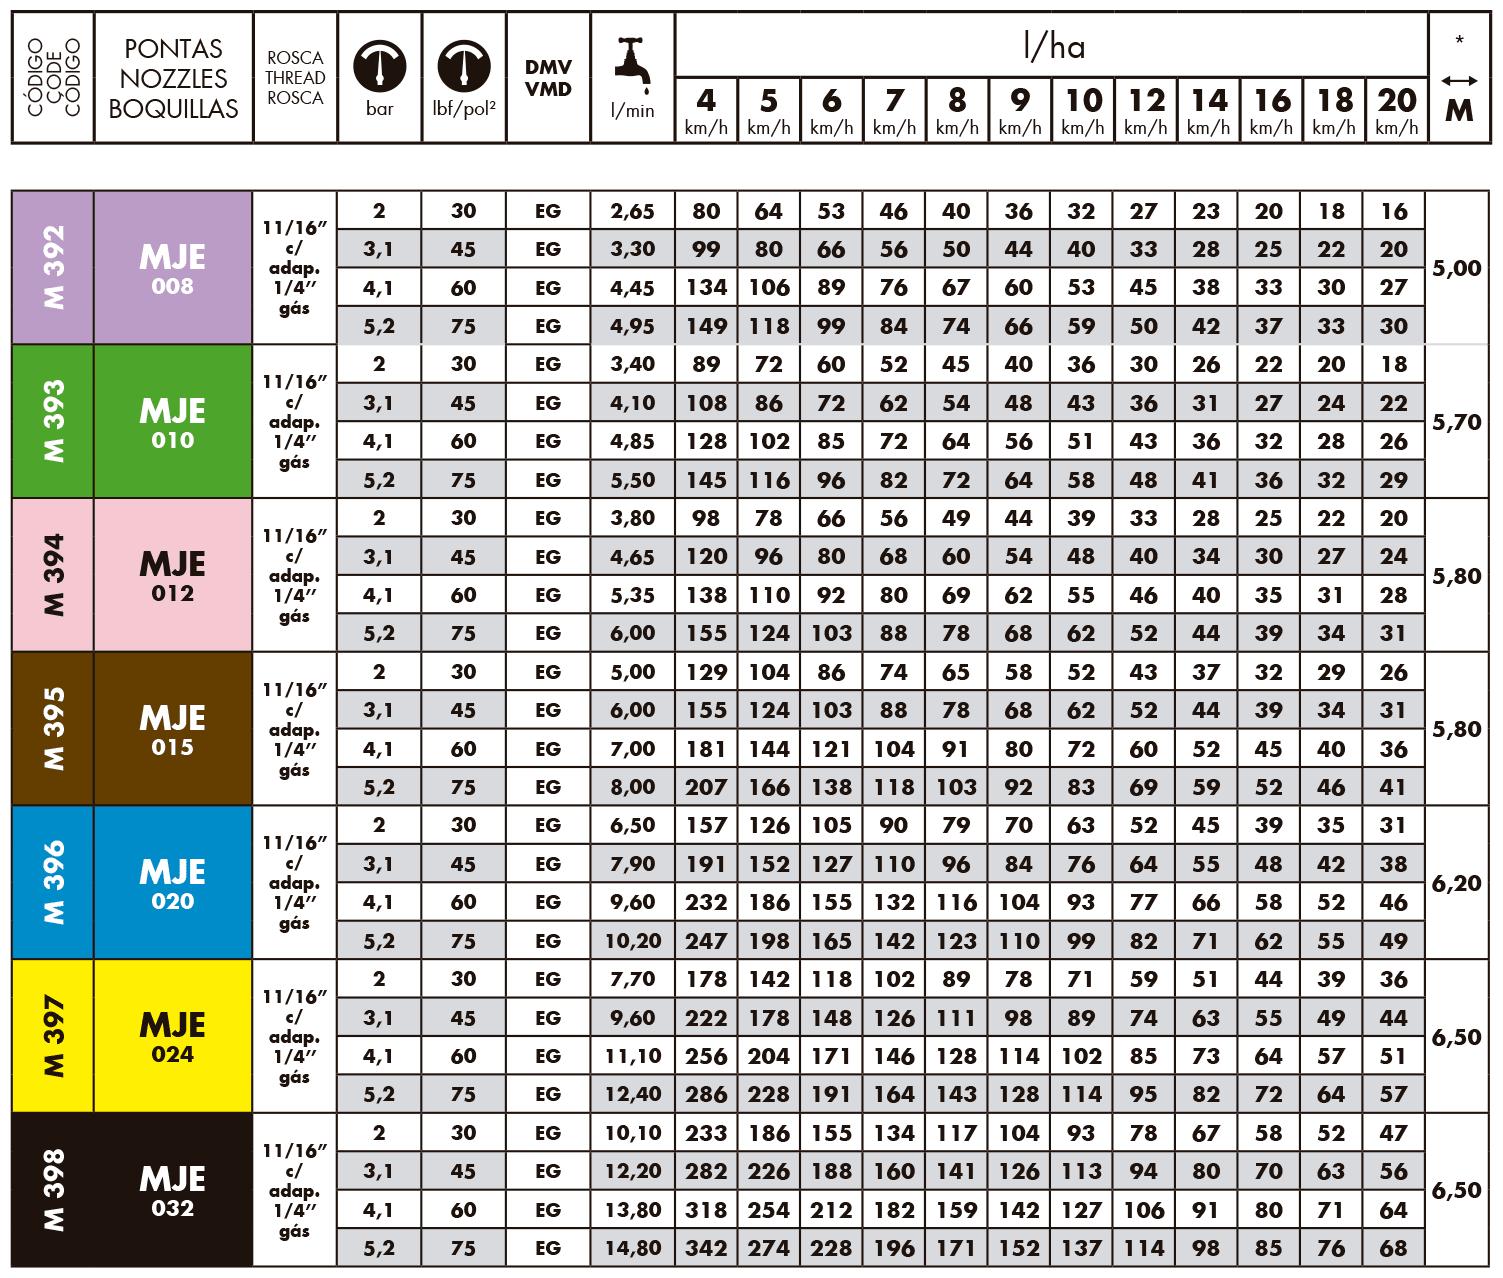 Tabela de Vazoes